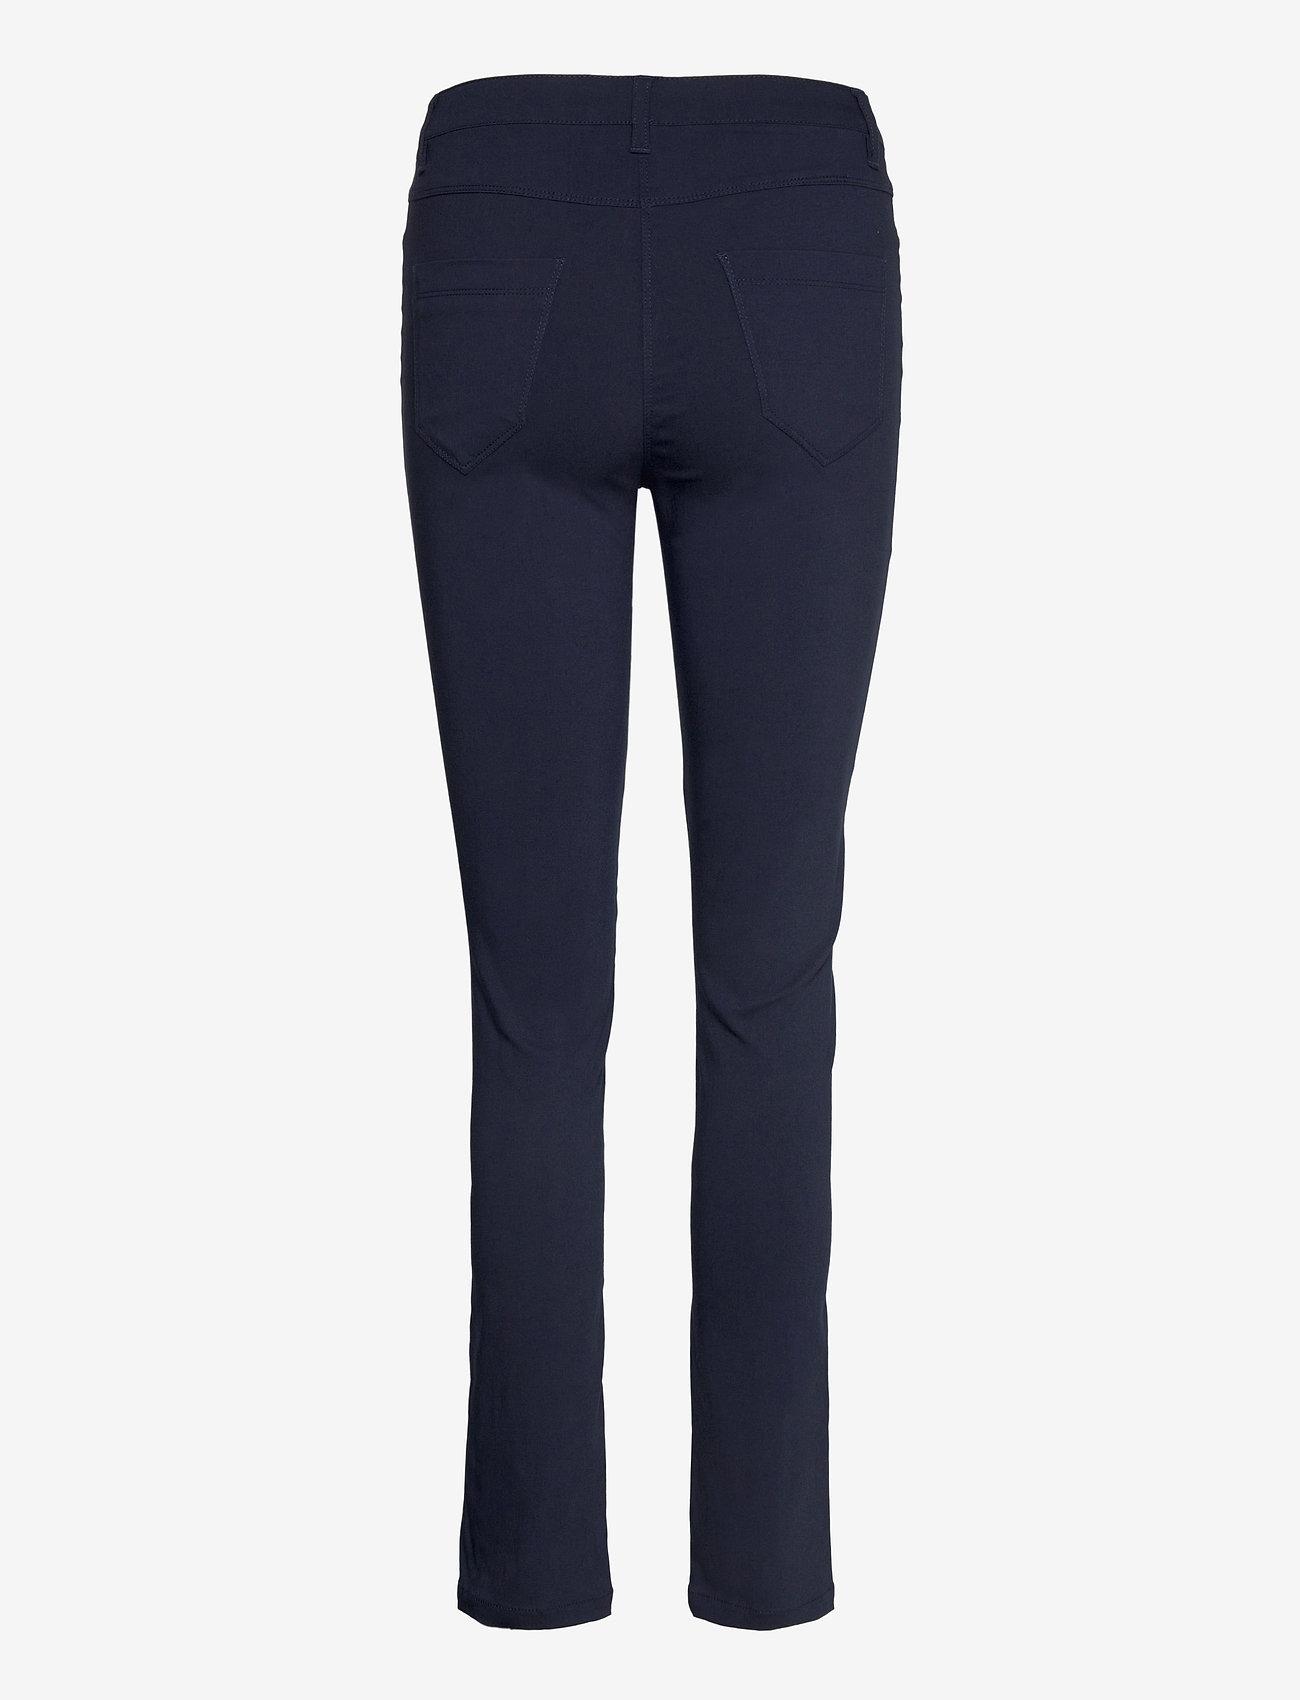 Soyaconcept - SC-LILLY - slim jeans - navy - 1